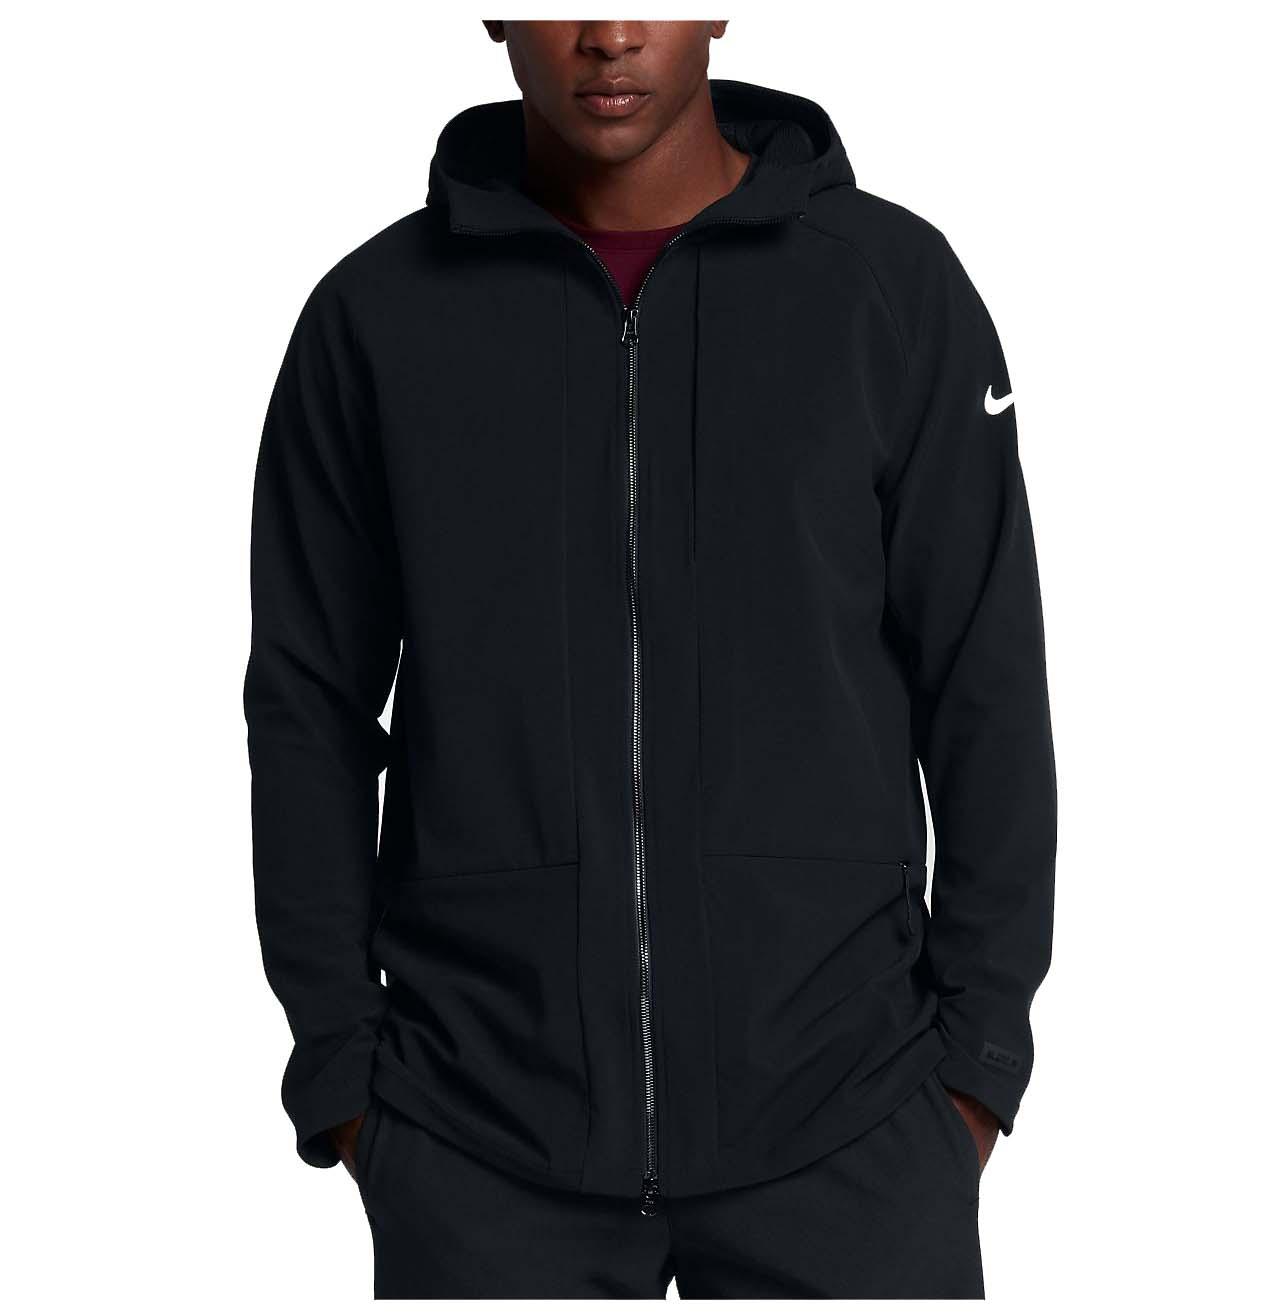 new style 7a3a9 f2461 Nike mens shield lebron trench basketball jacket black ebay jpg 1280x1316 Basketball  jacket